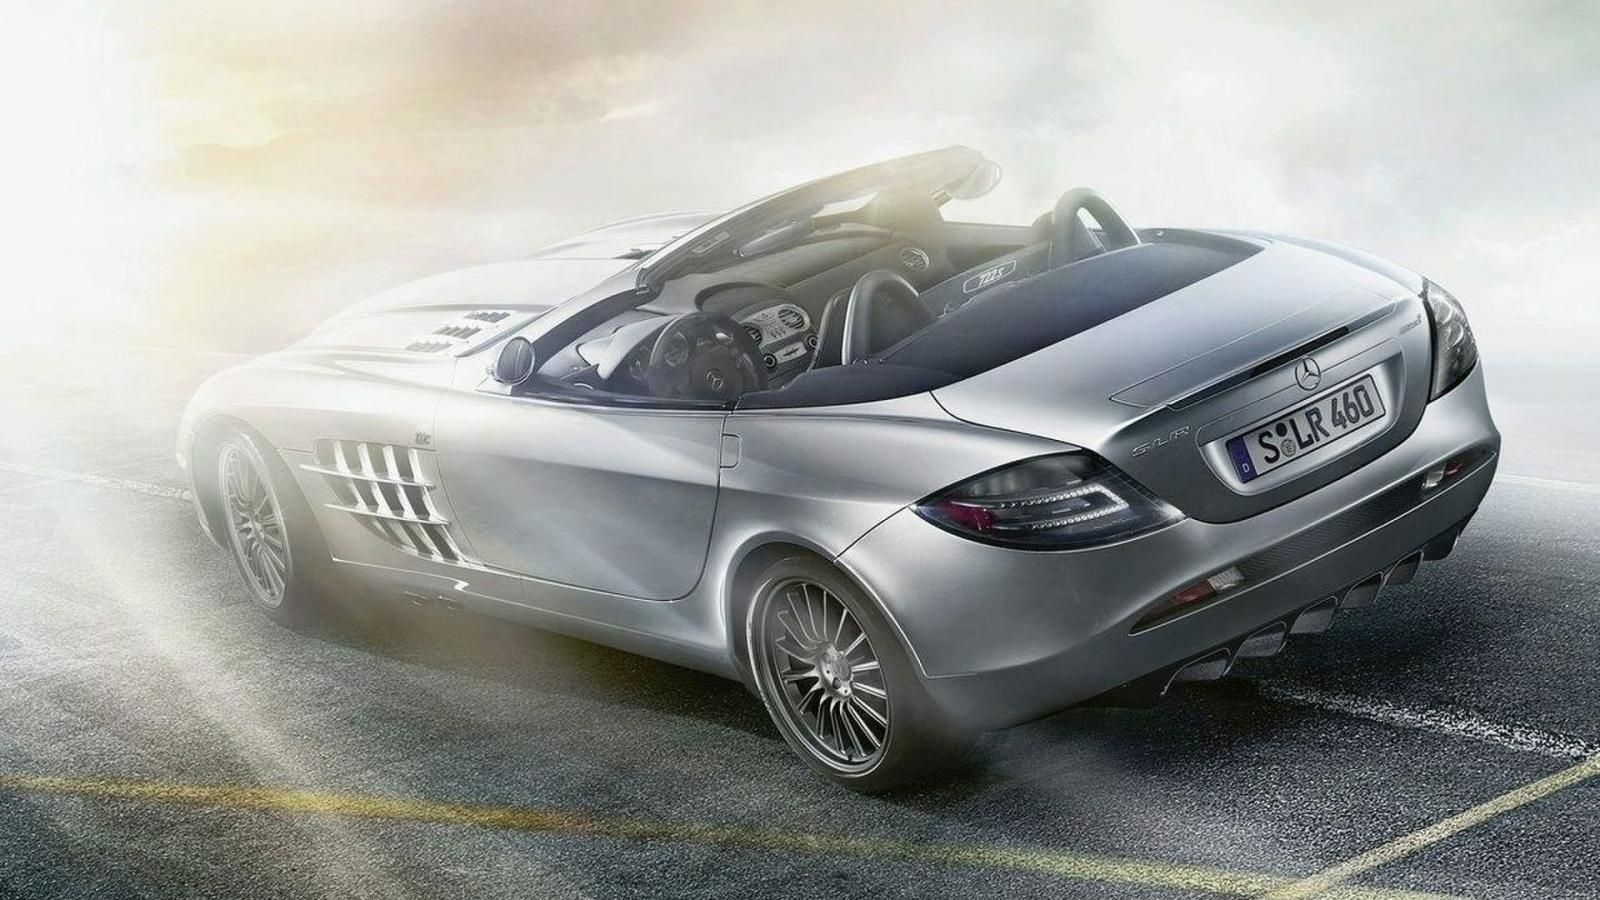 The Mercedes SLR Mclarenangulat rear